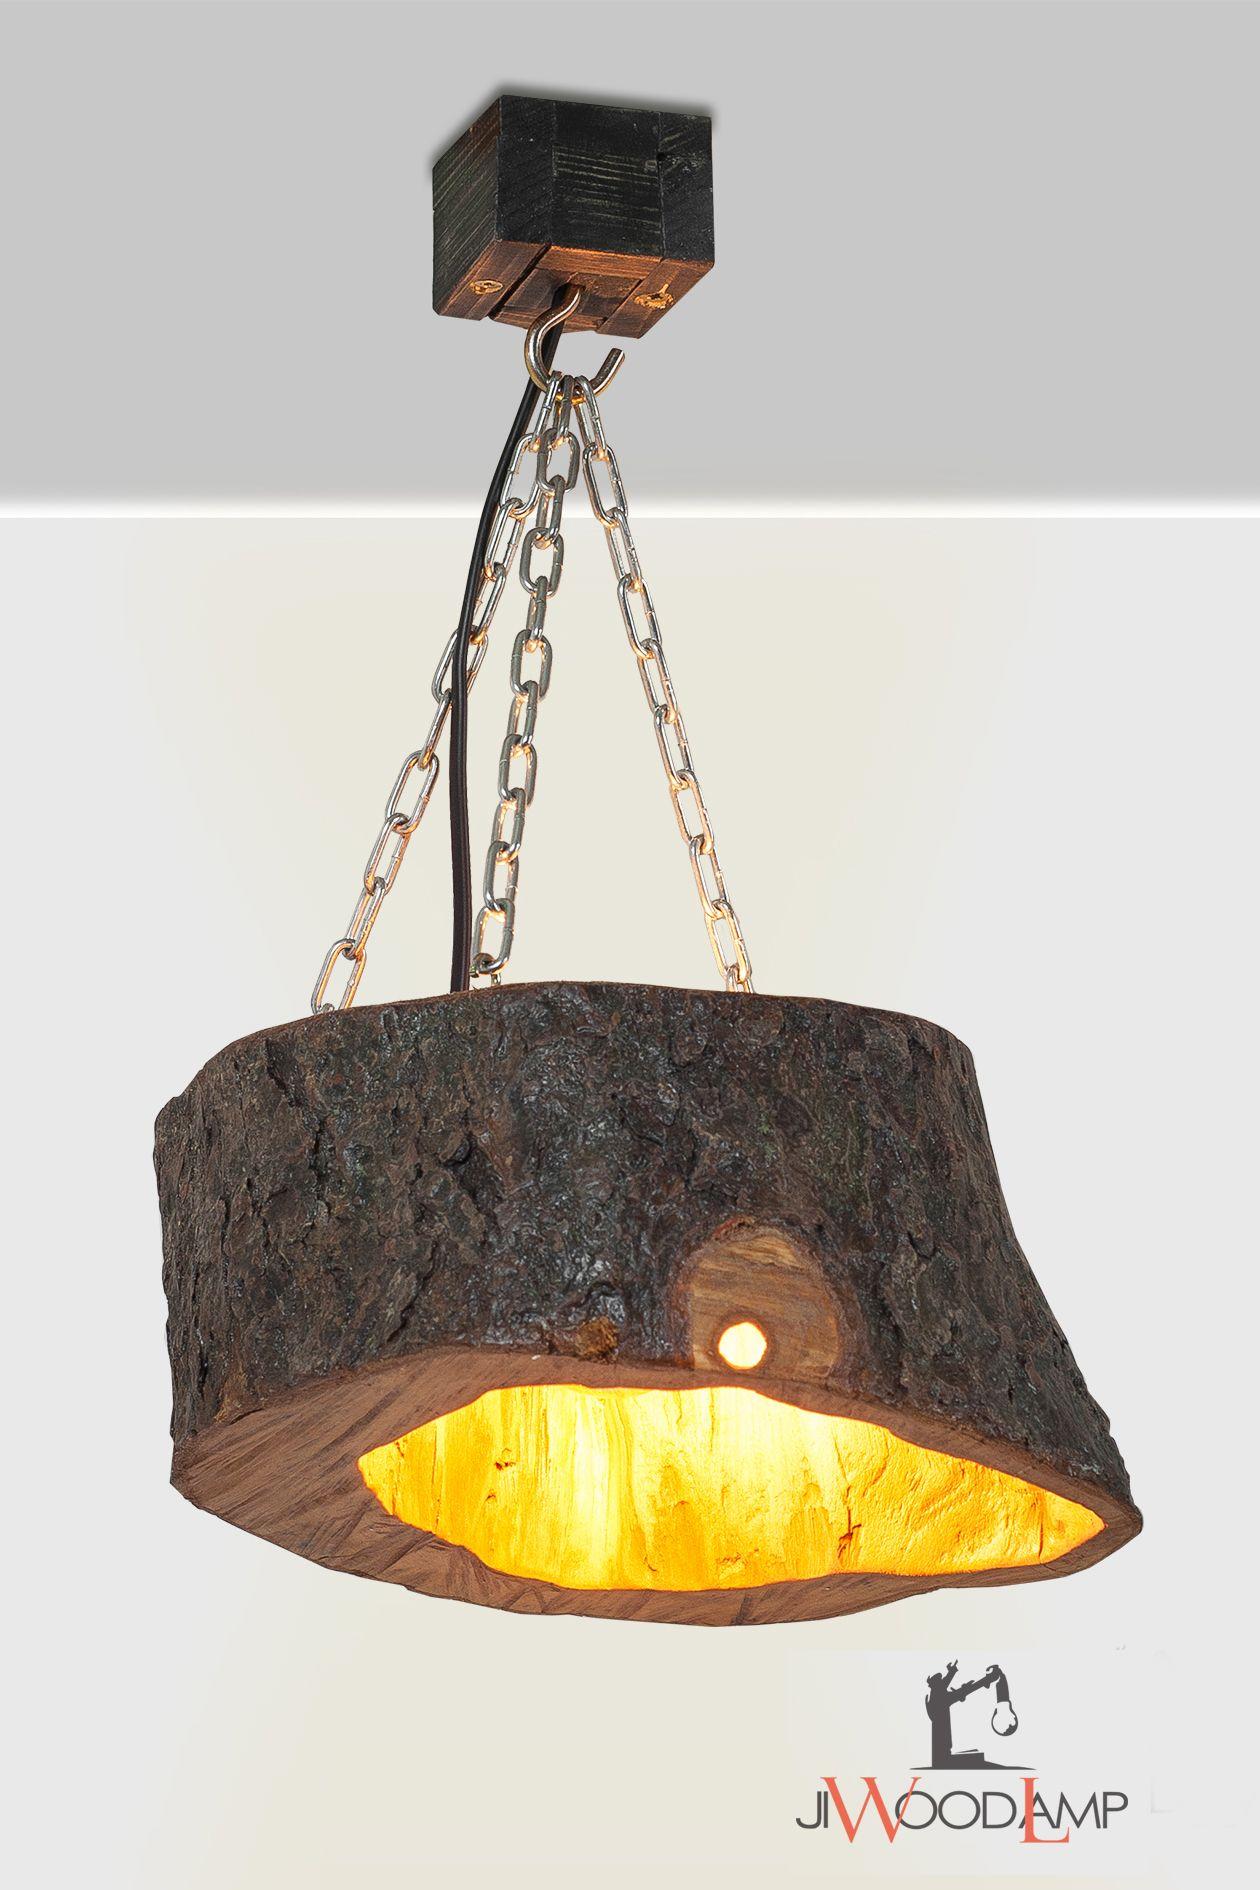 Slice Wood Pendant Light Wood Pendant Lamp Ceiling Fixture Rustic Hanging Lamp Kitchen Lamp Reclaimed Wood Lamp Farm House Lighting Wood Pendant Light Wood Lamps Wooden Pendant Lamp